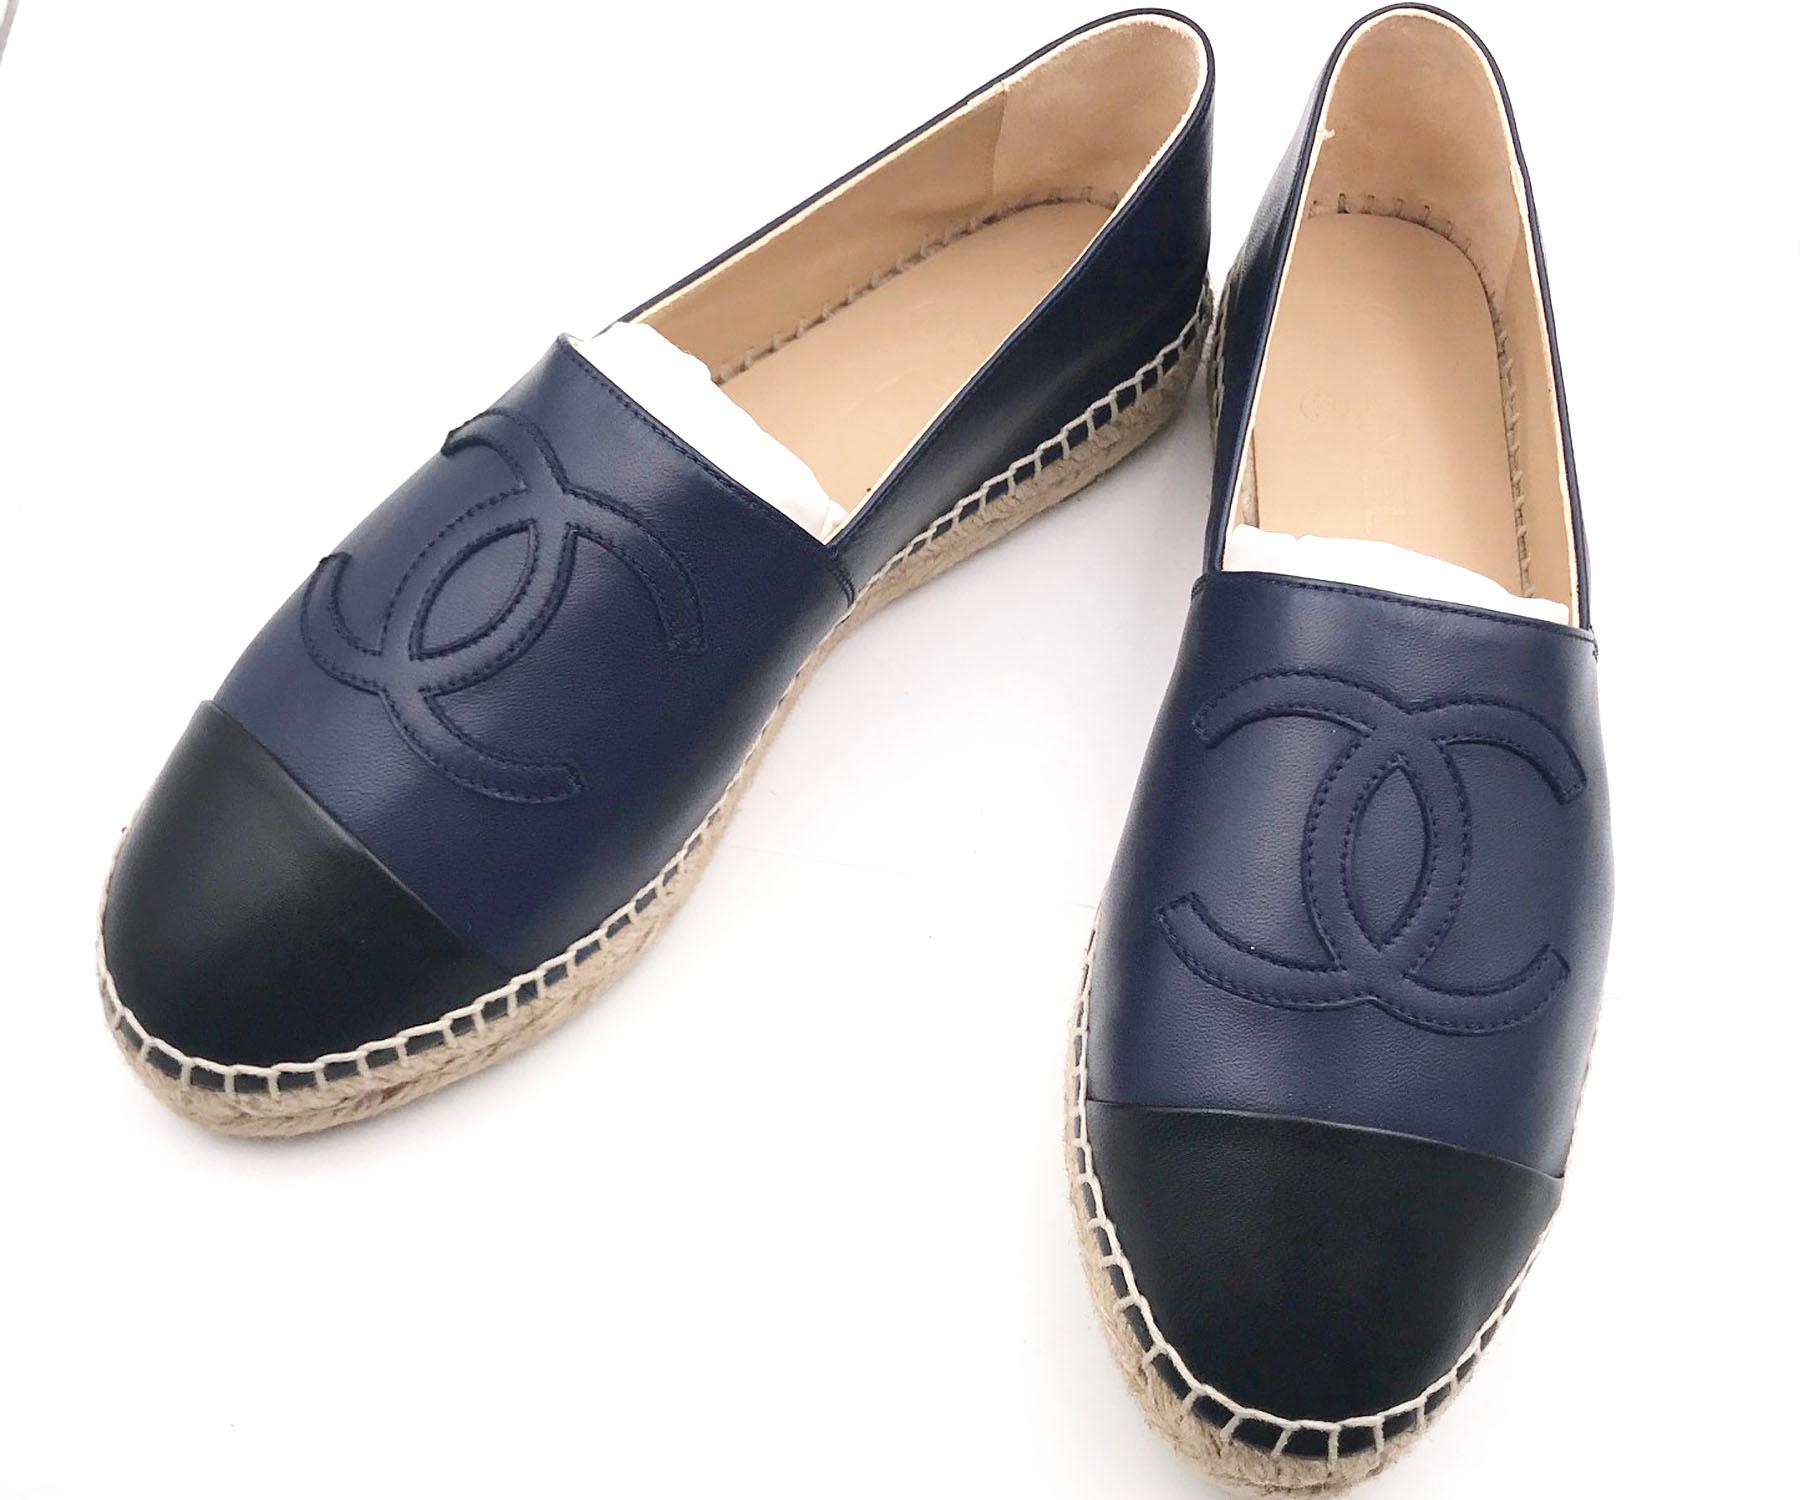 Chanel Brand New Navy Black Leather Espadrilles Flats